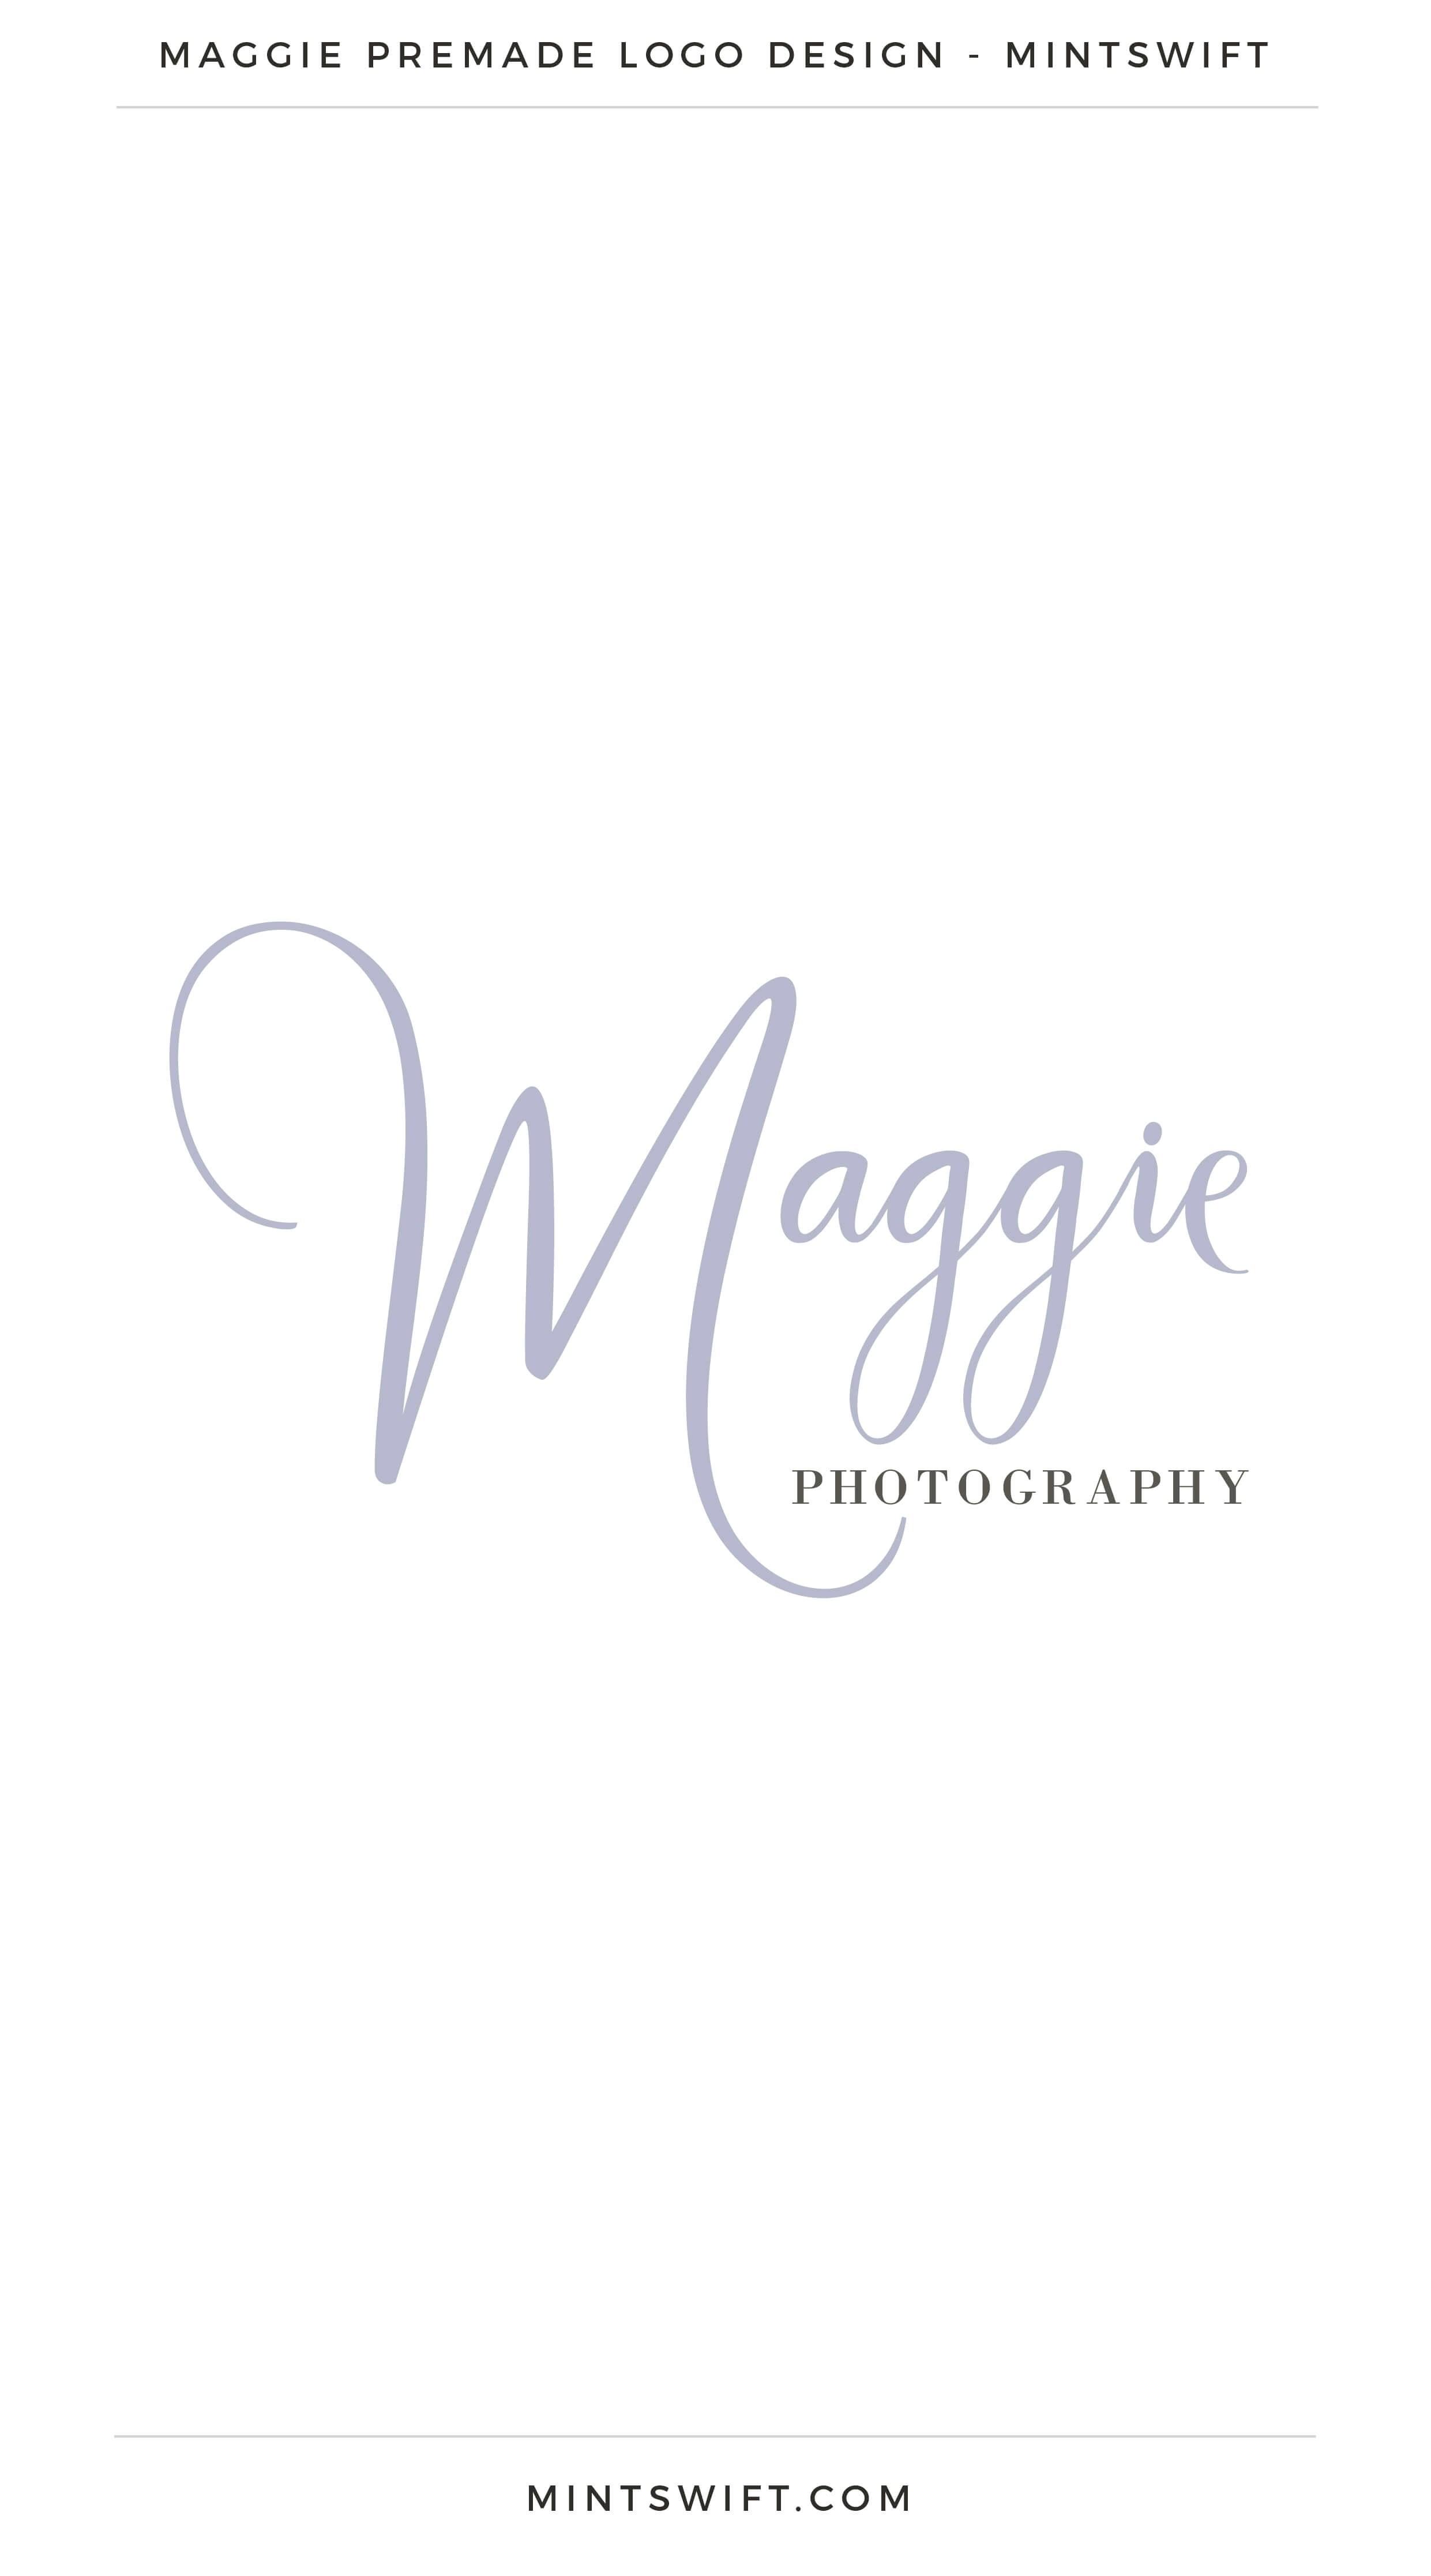 Maggie Premade Logo | Premade Logo | Premade logos | Pre-made logo | Premade Brand Design| Branding | Brand Design | Logo Shop | Branding kits shop | MintSwift Shop | Premade logo design | Add-On | Logo Design | MintSwift| Adrianna Glowacka | MintSwift Design